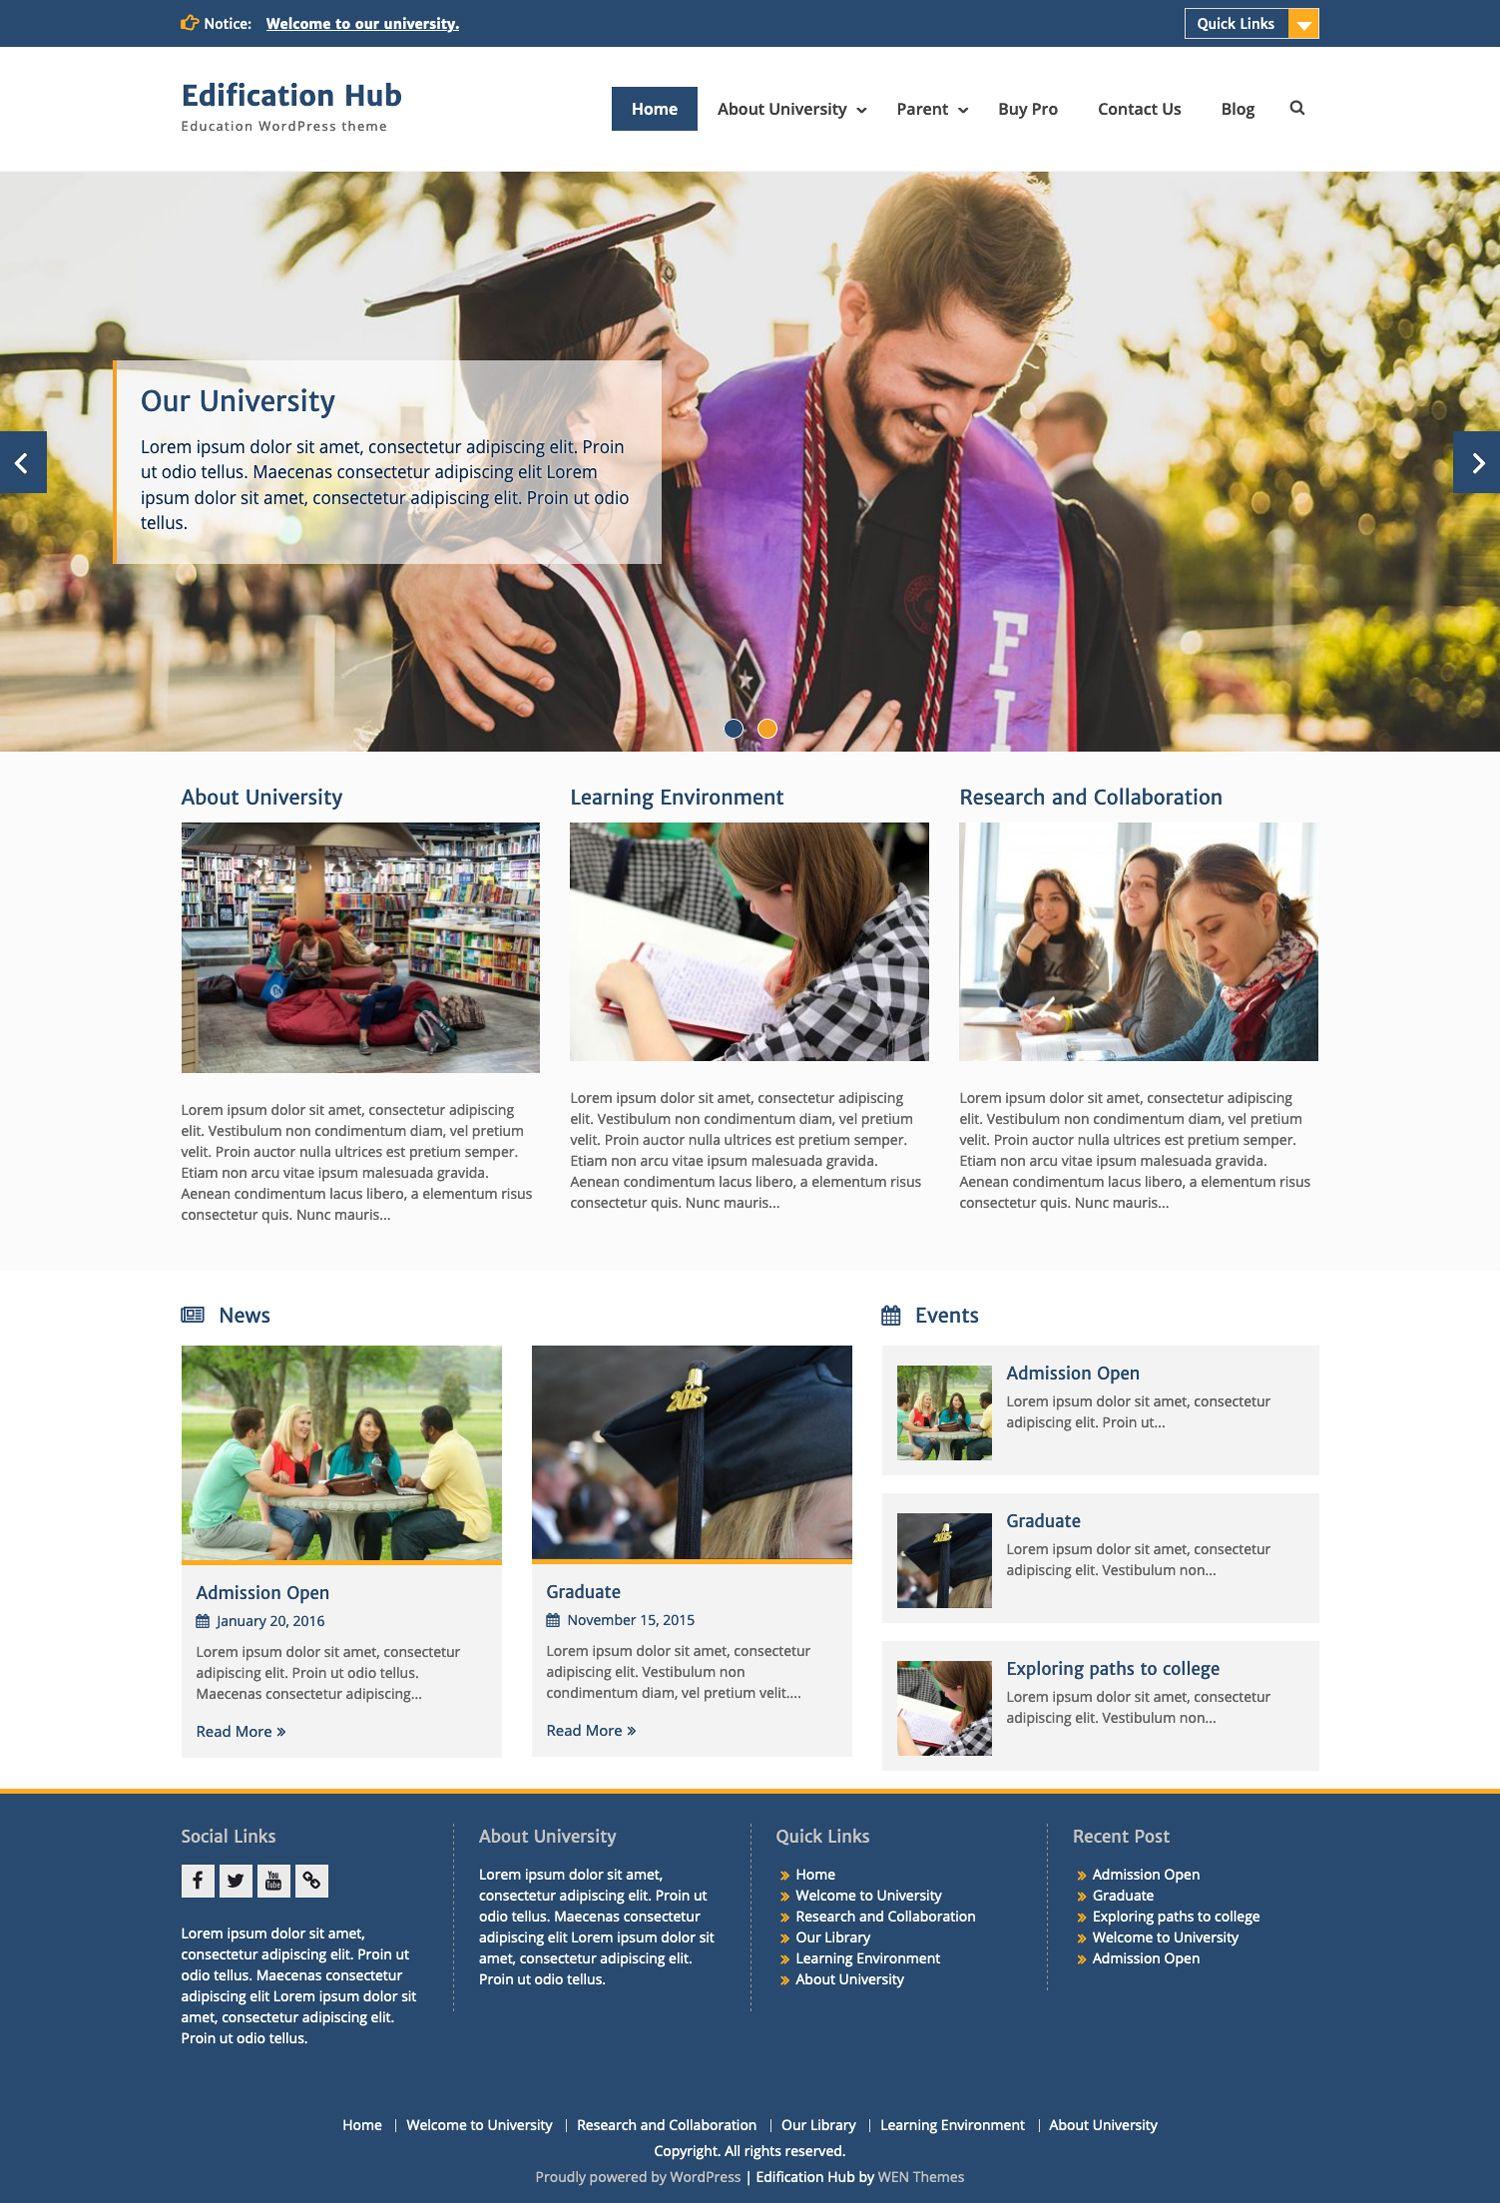 Edification Hub